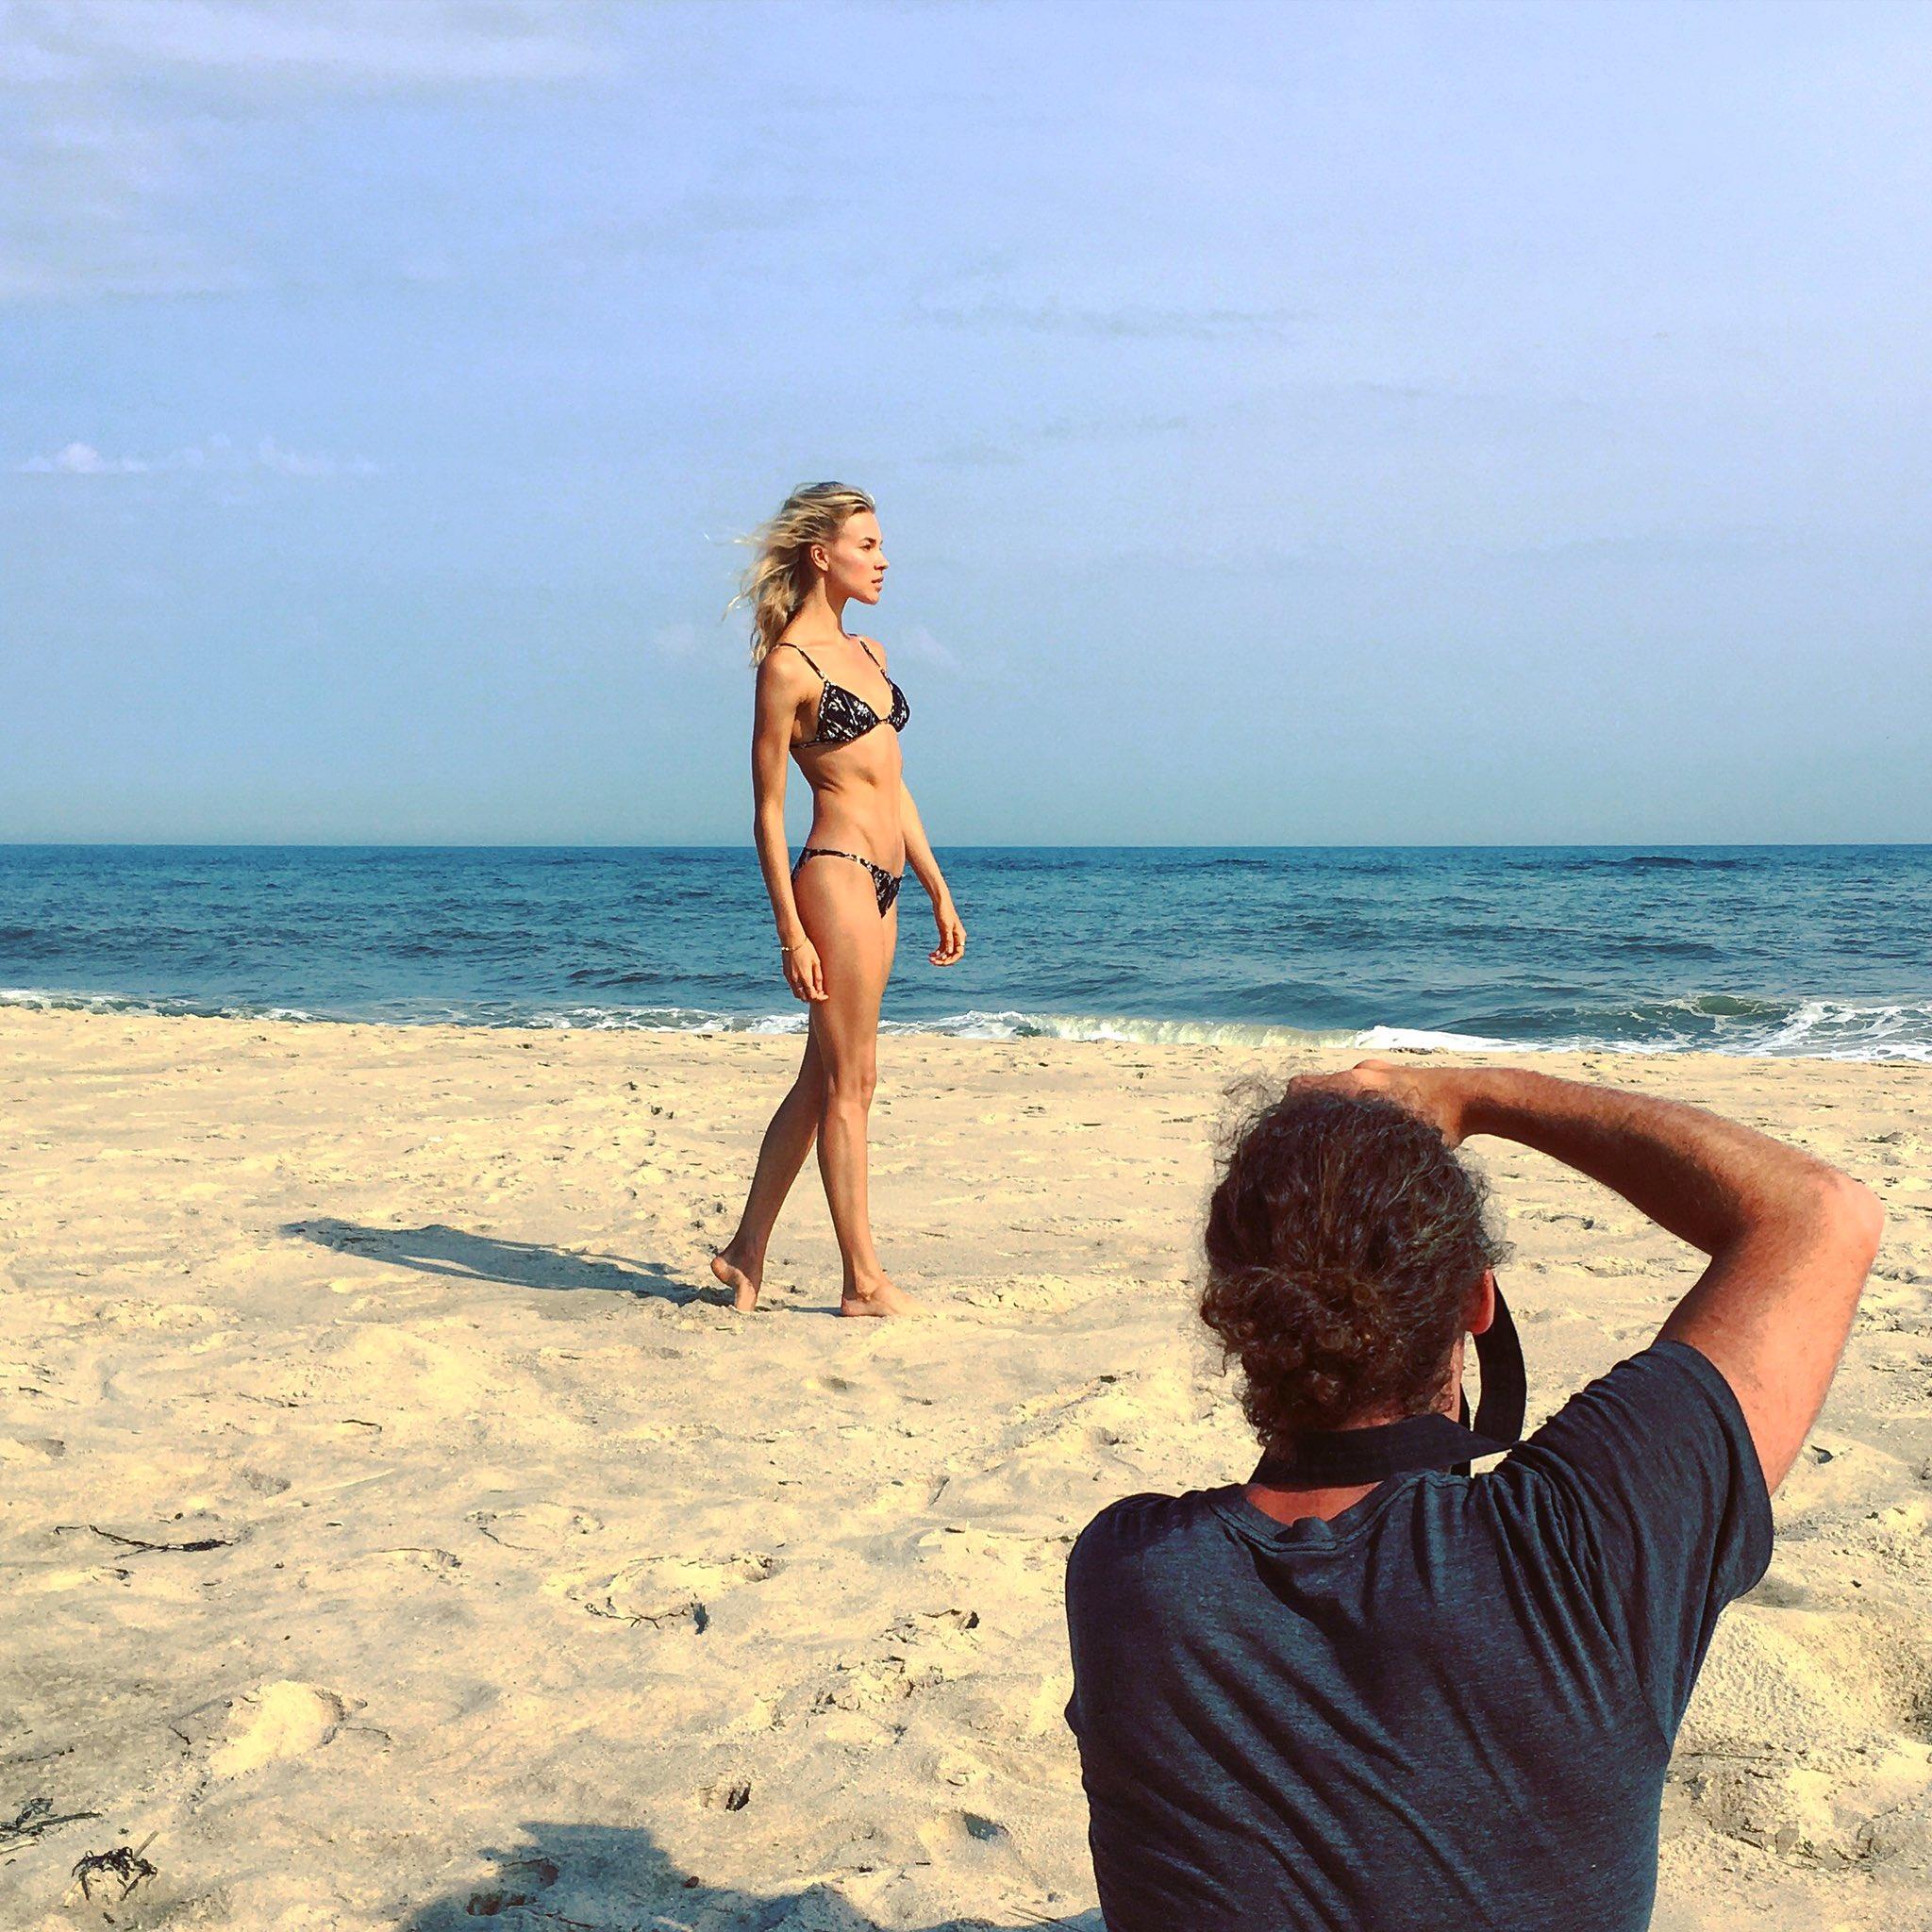 #bts from last week's #beach shoot 🏖 https://t.co/Vd6kWBXSaB